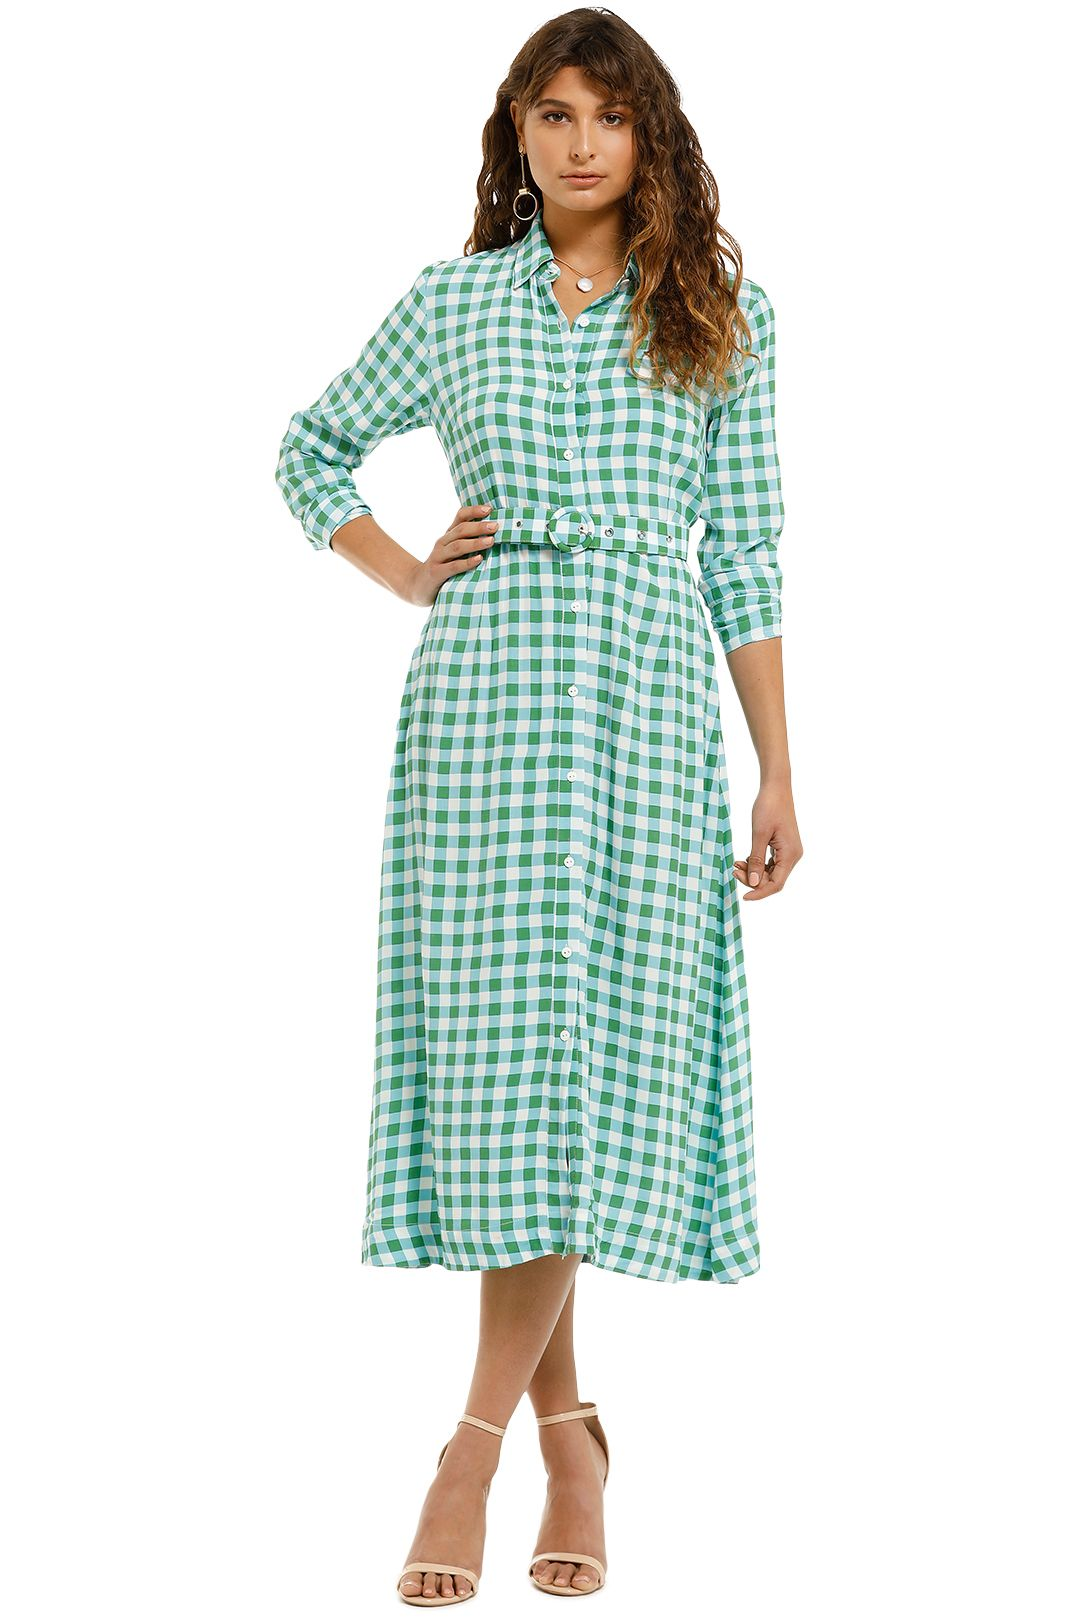 SWF-Long-Sleeve-Shirt-Dress-Gingham-Mint-Front